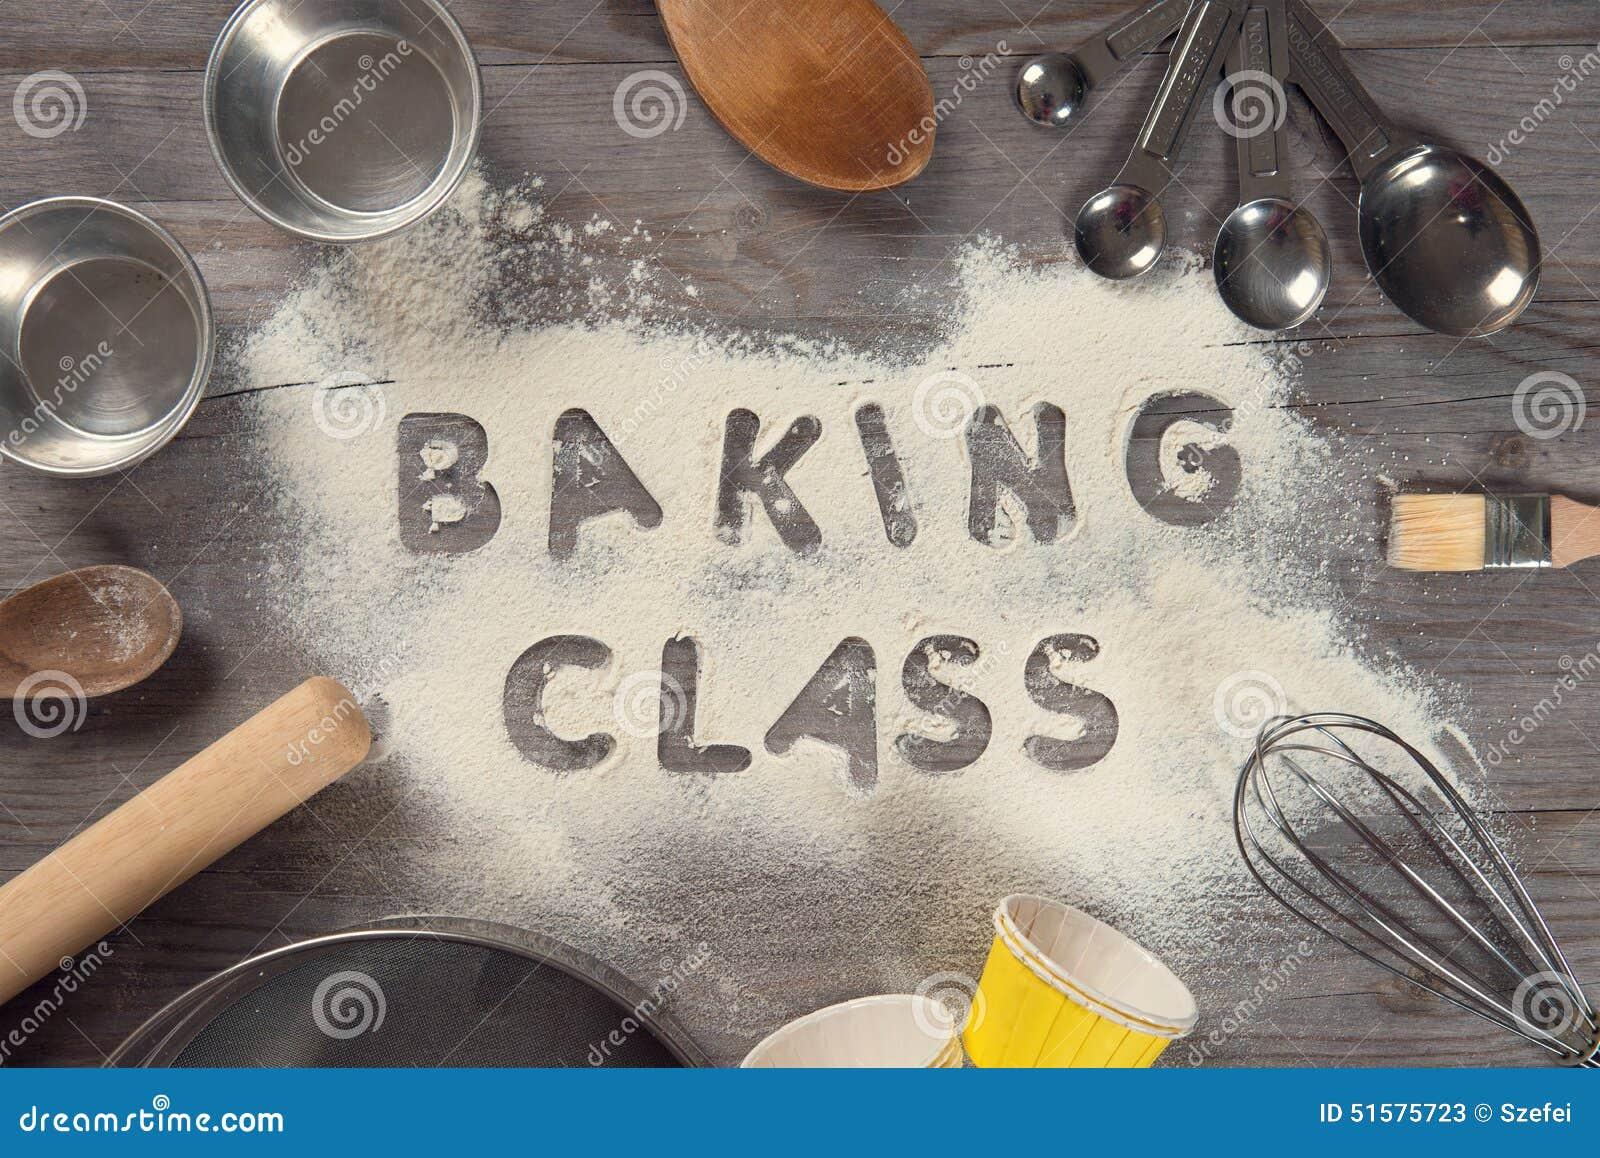 Word Baking Class Written In White Flour Stock Photo